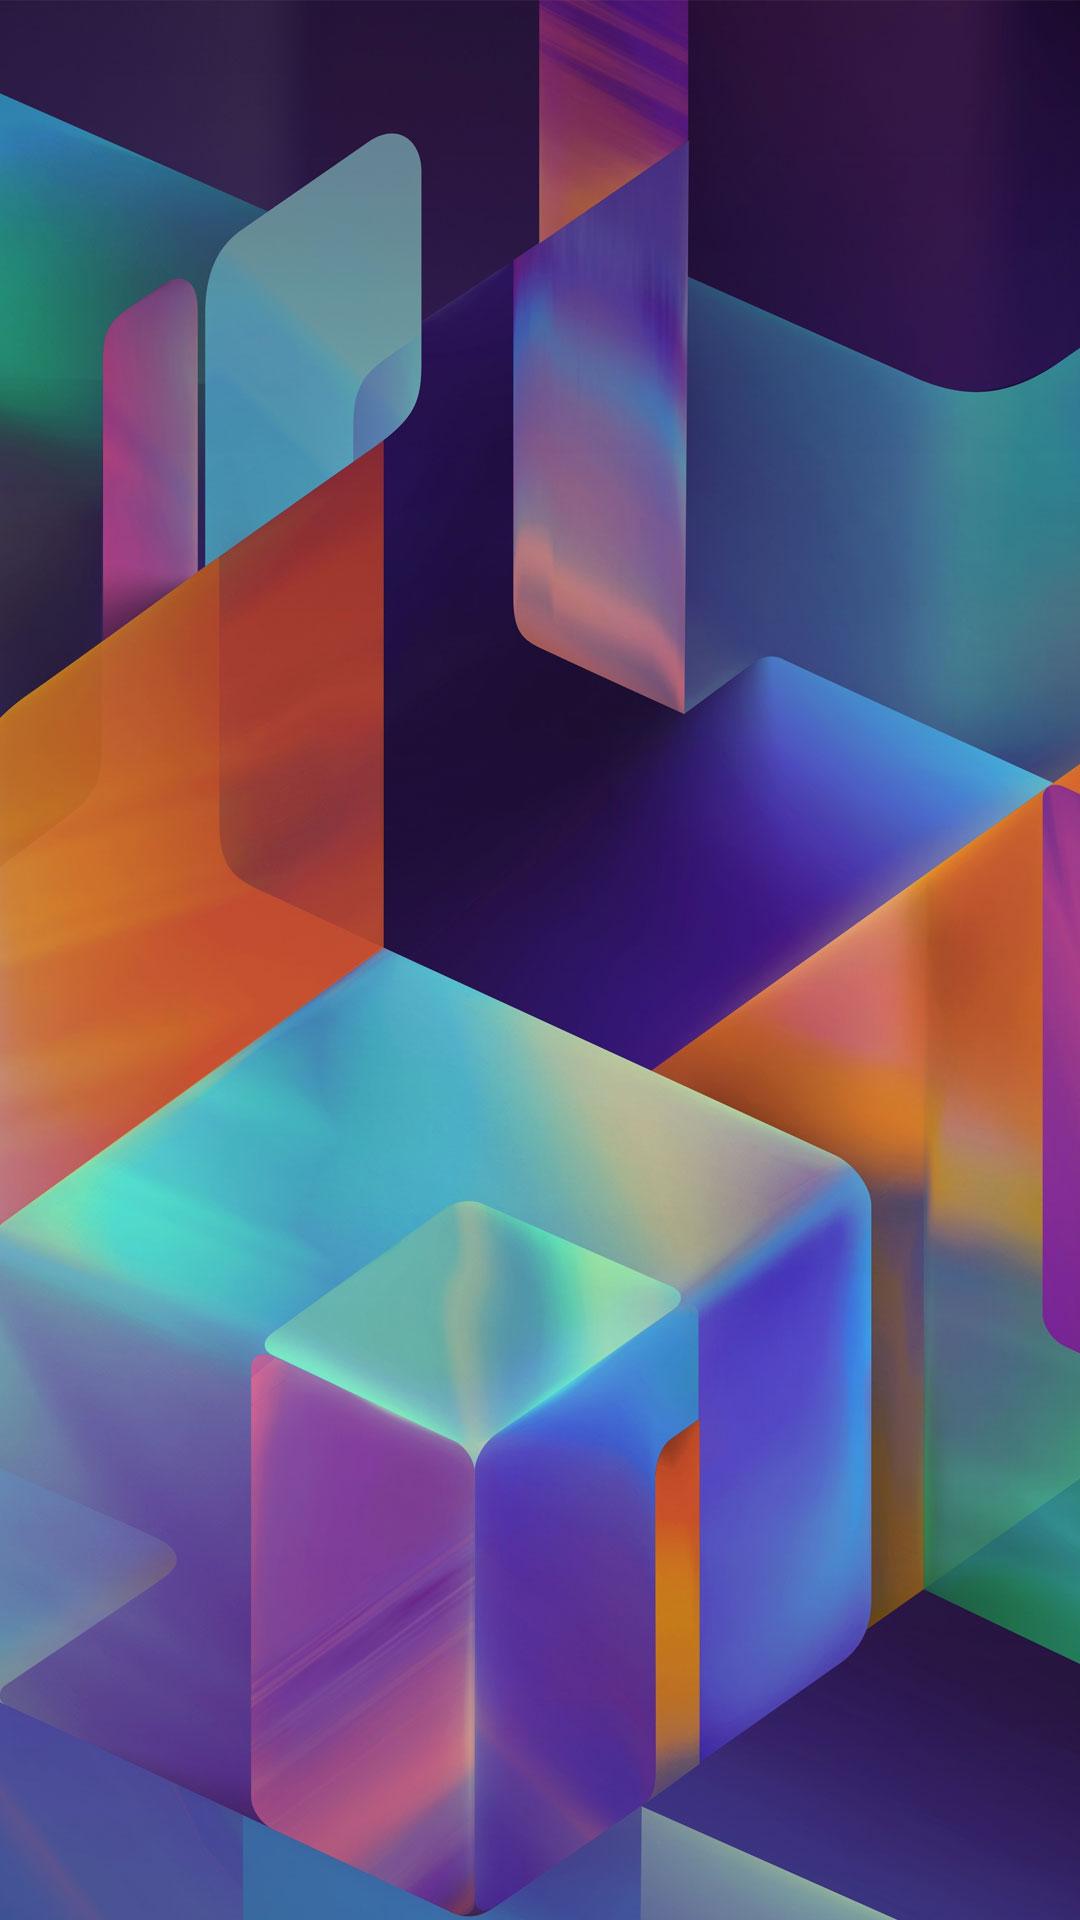 Iphone Girly Colorful Wallpaper Hd Novocom Top